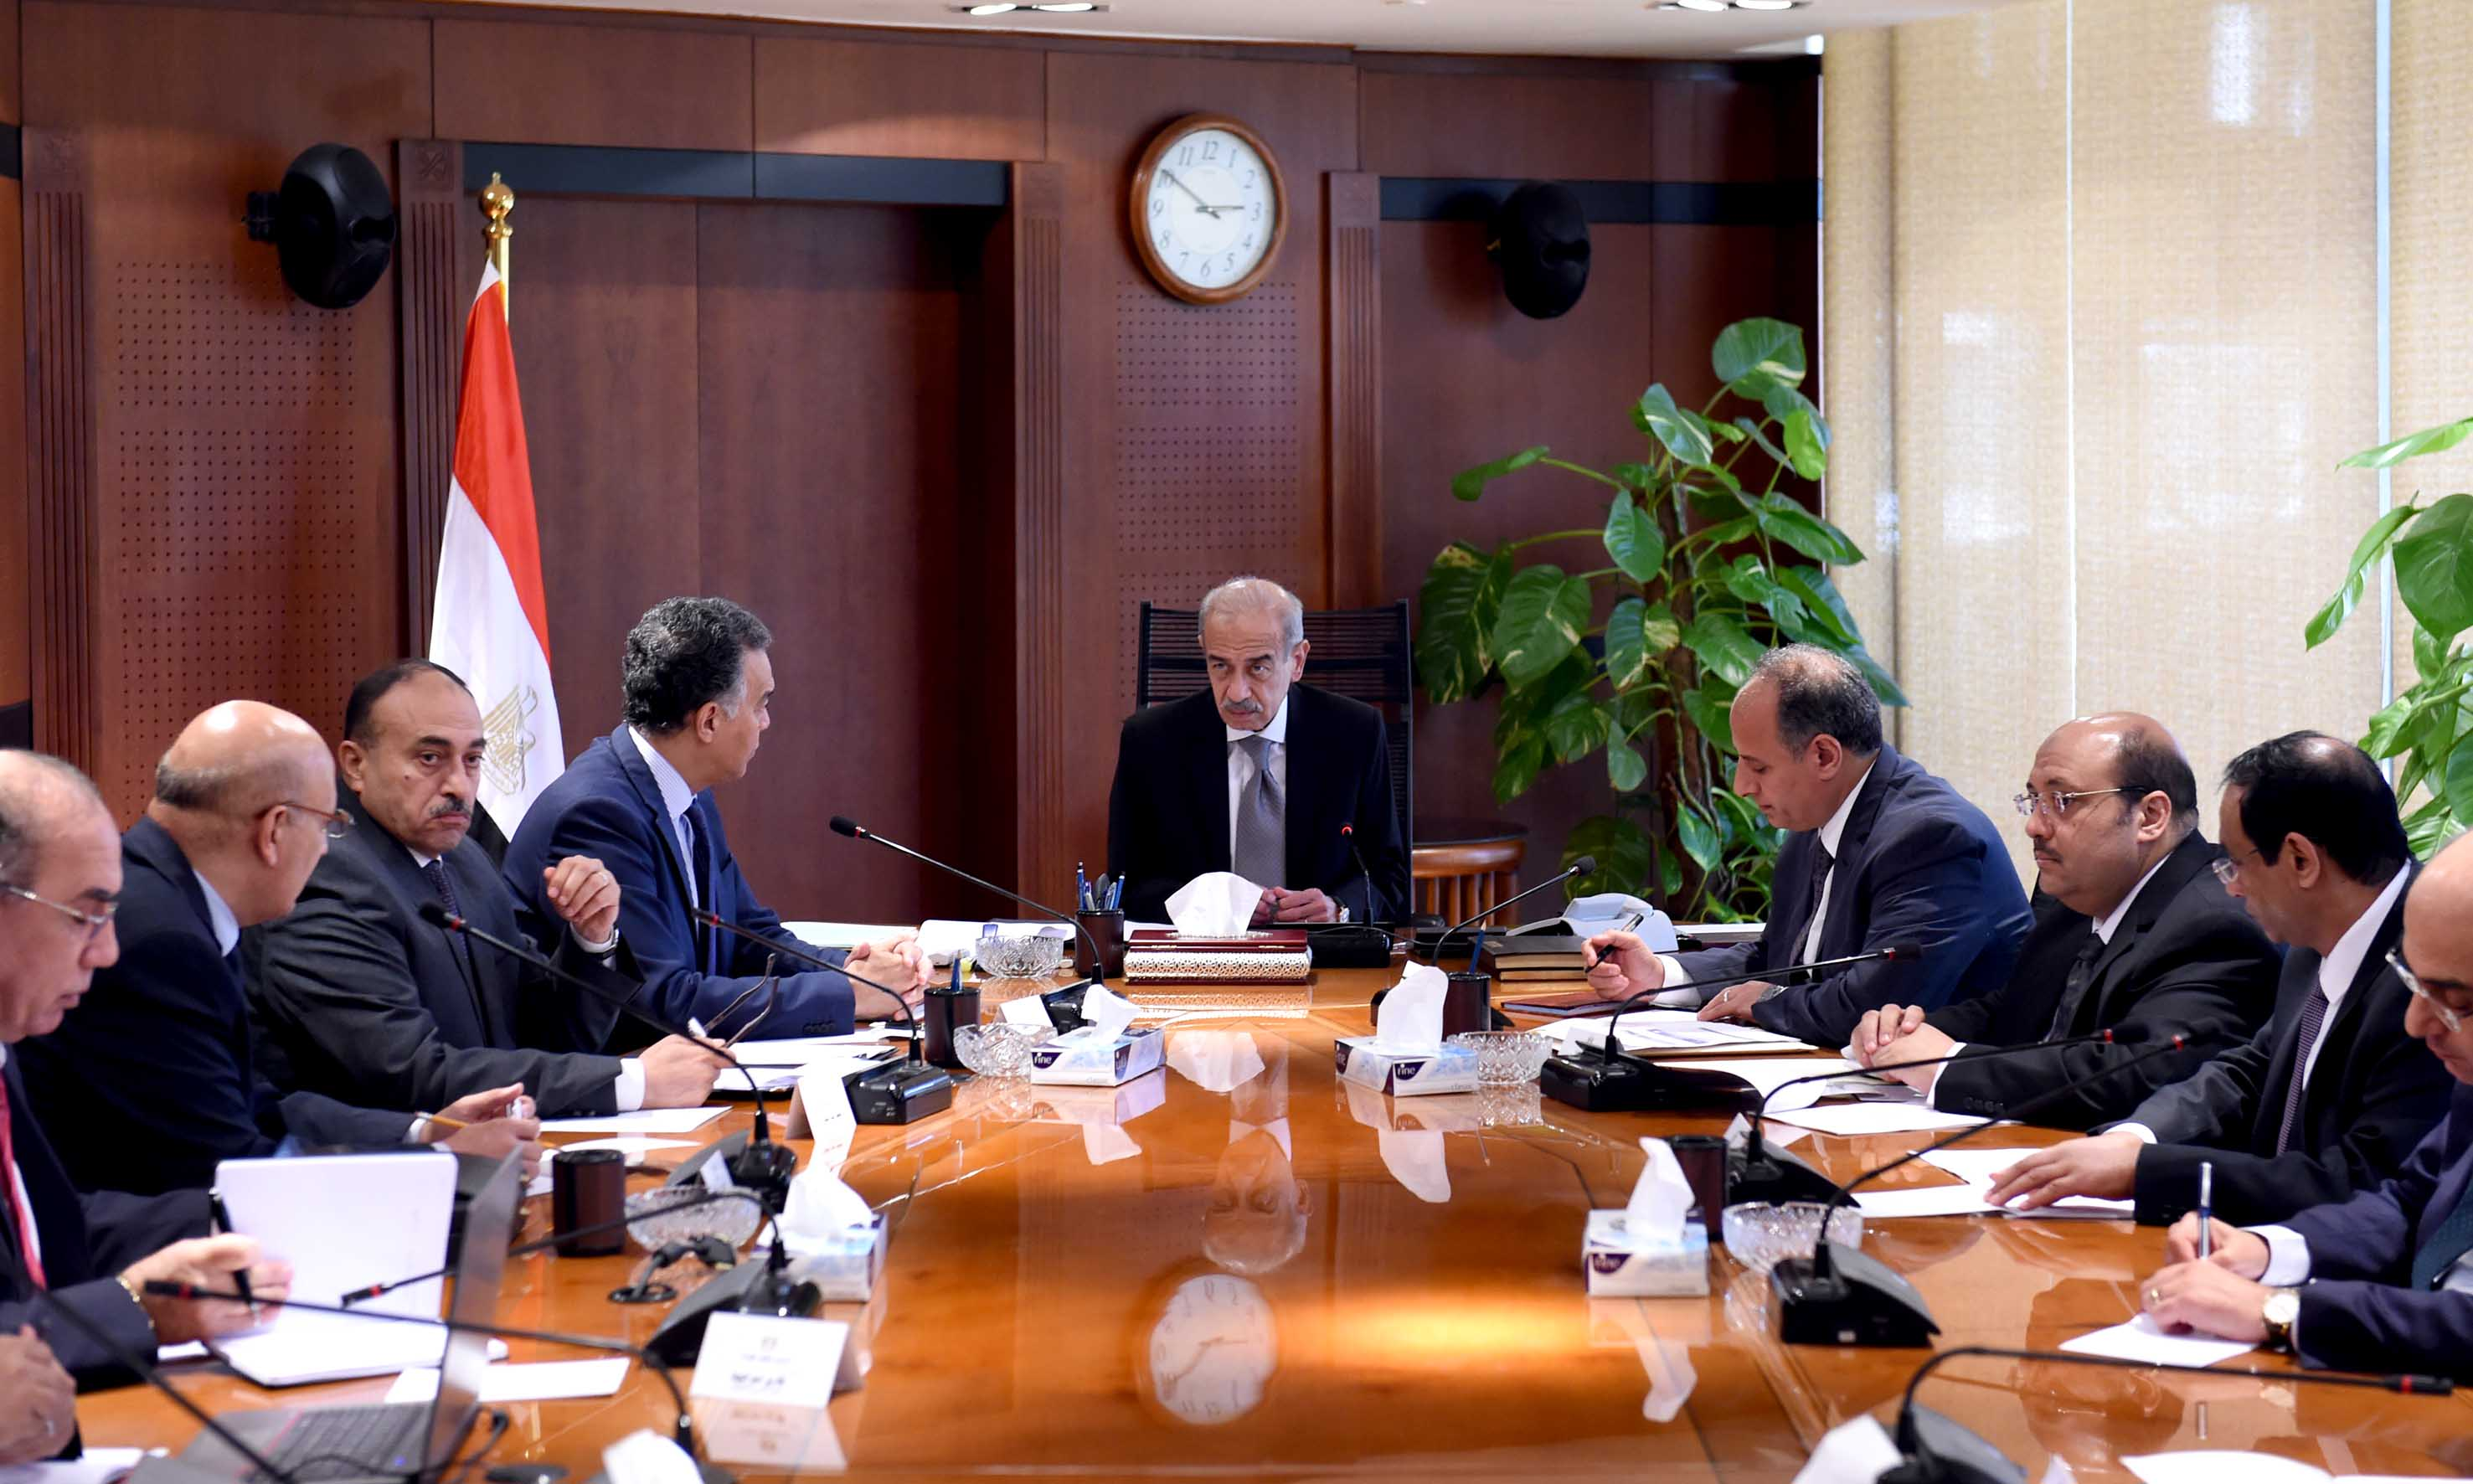 شريف اسماعيل - اجتماع ترام اسكندرية